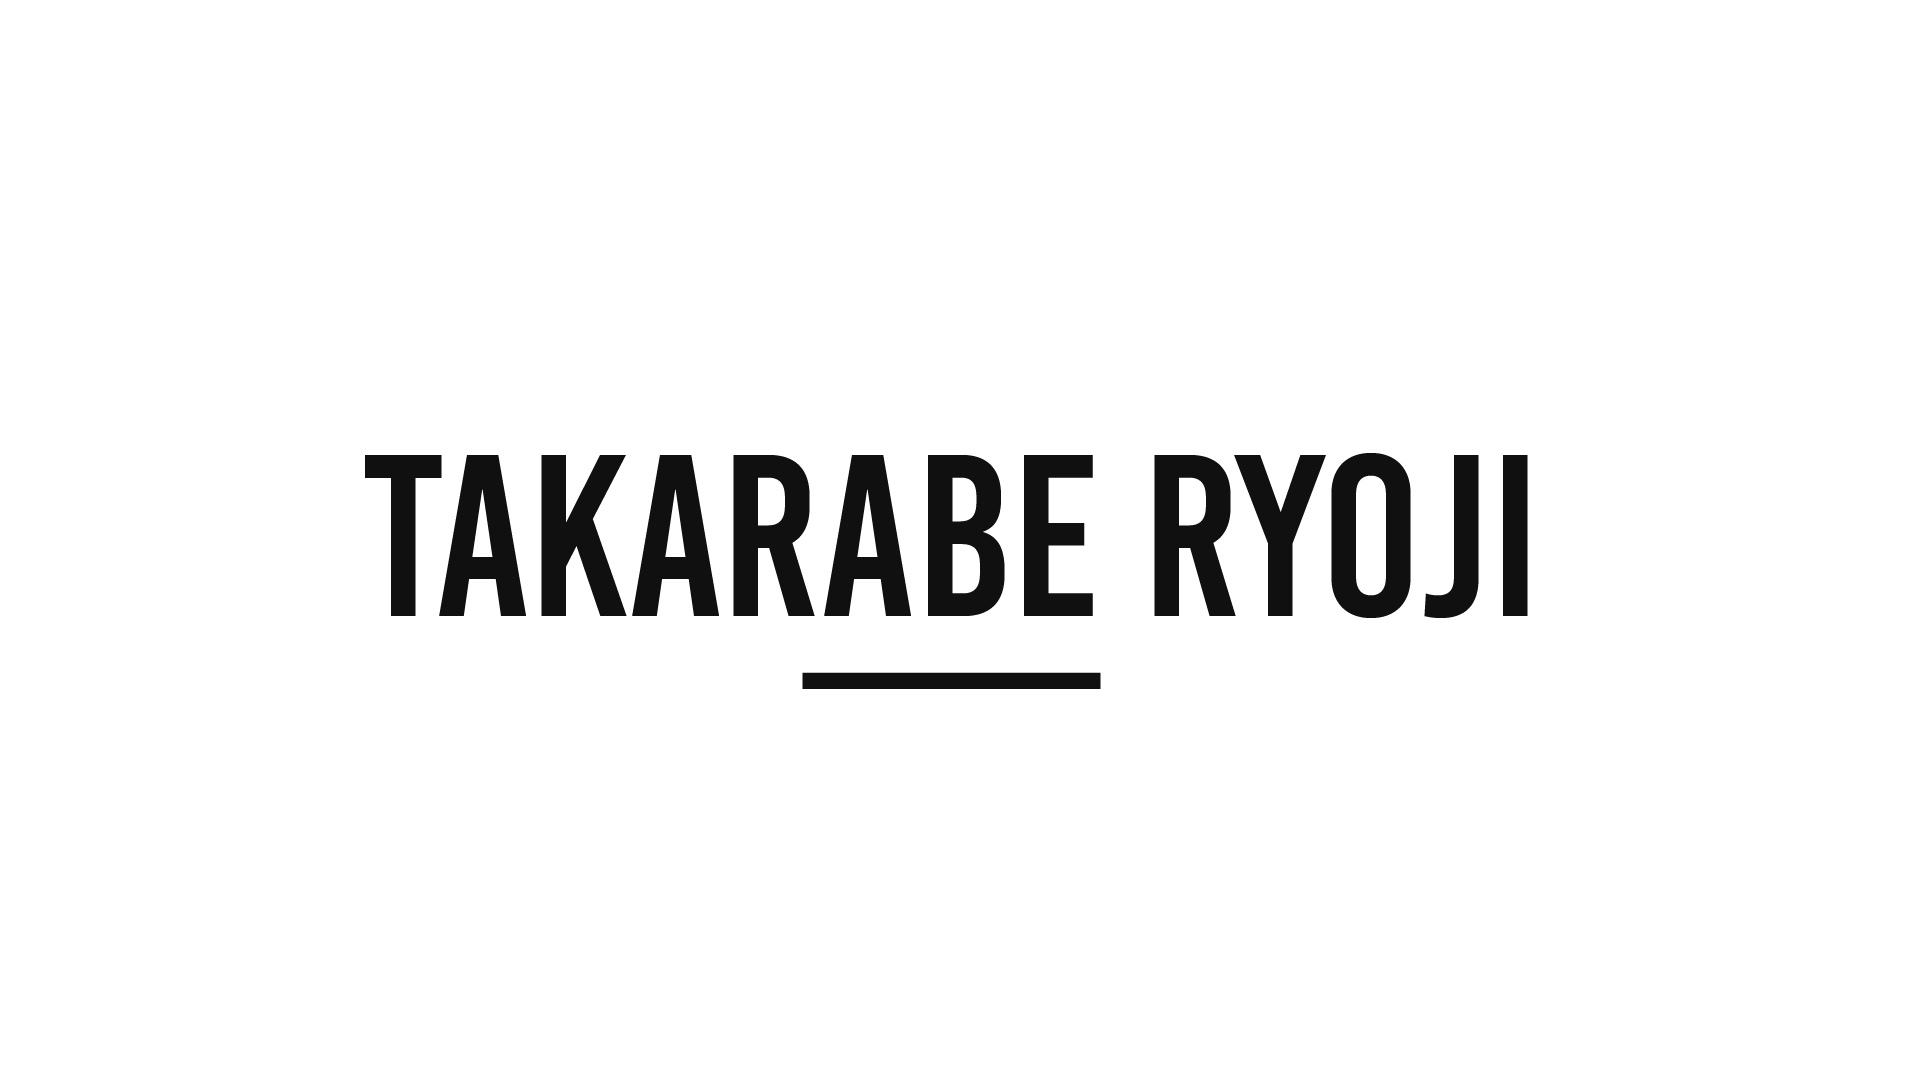 Takarabe Ryoji